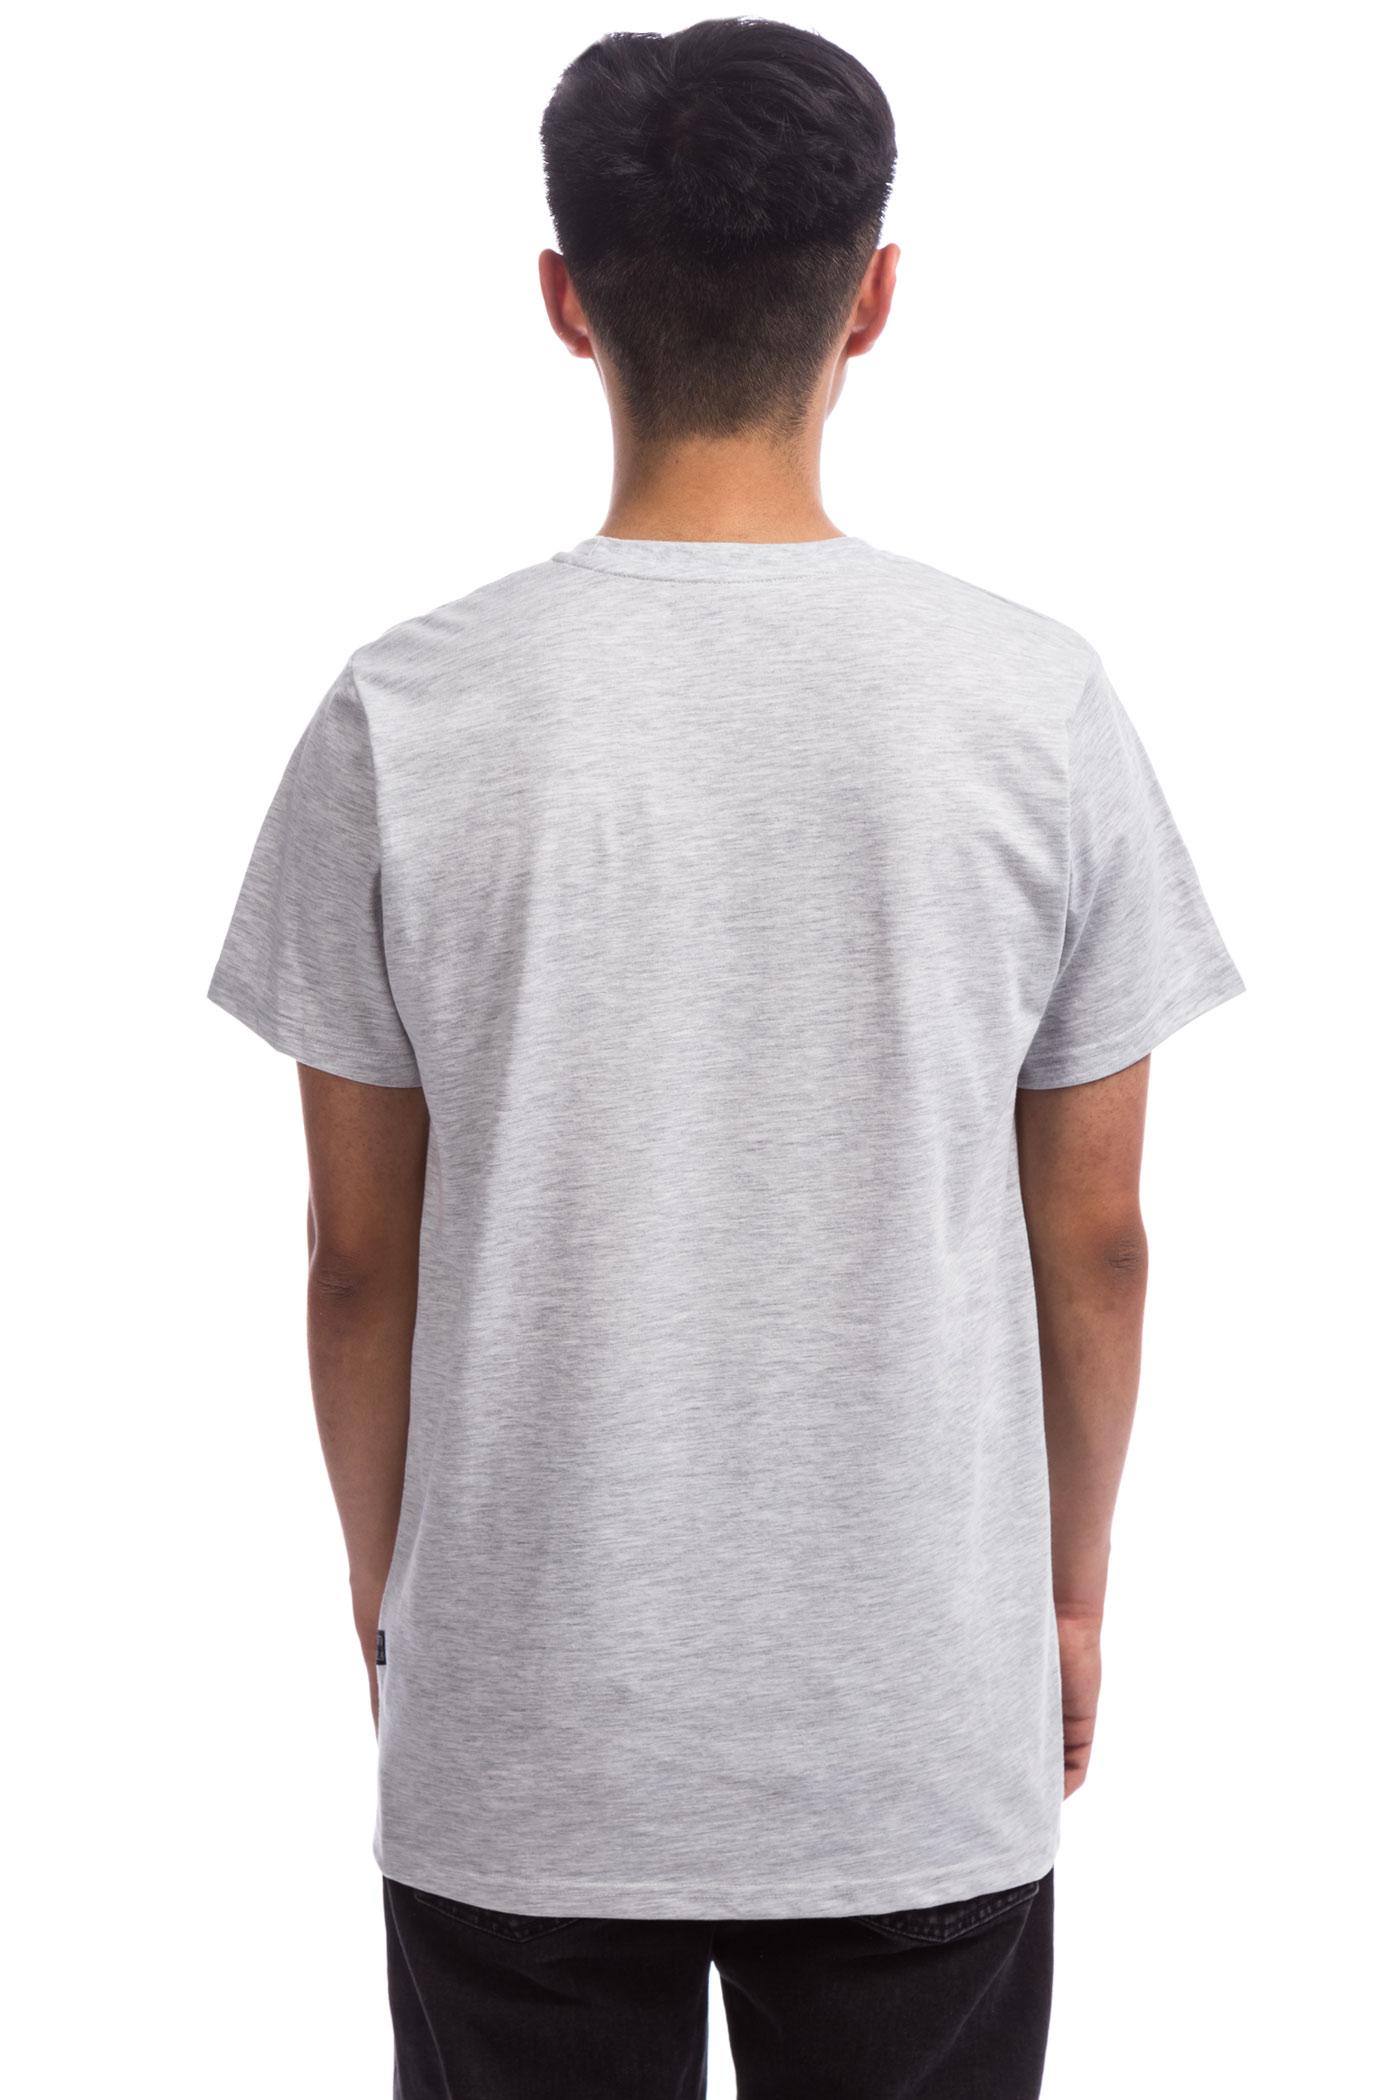 shirtheather Sk8dlx Prime T Prime White T Sk8dlx mvnN80Ow